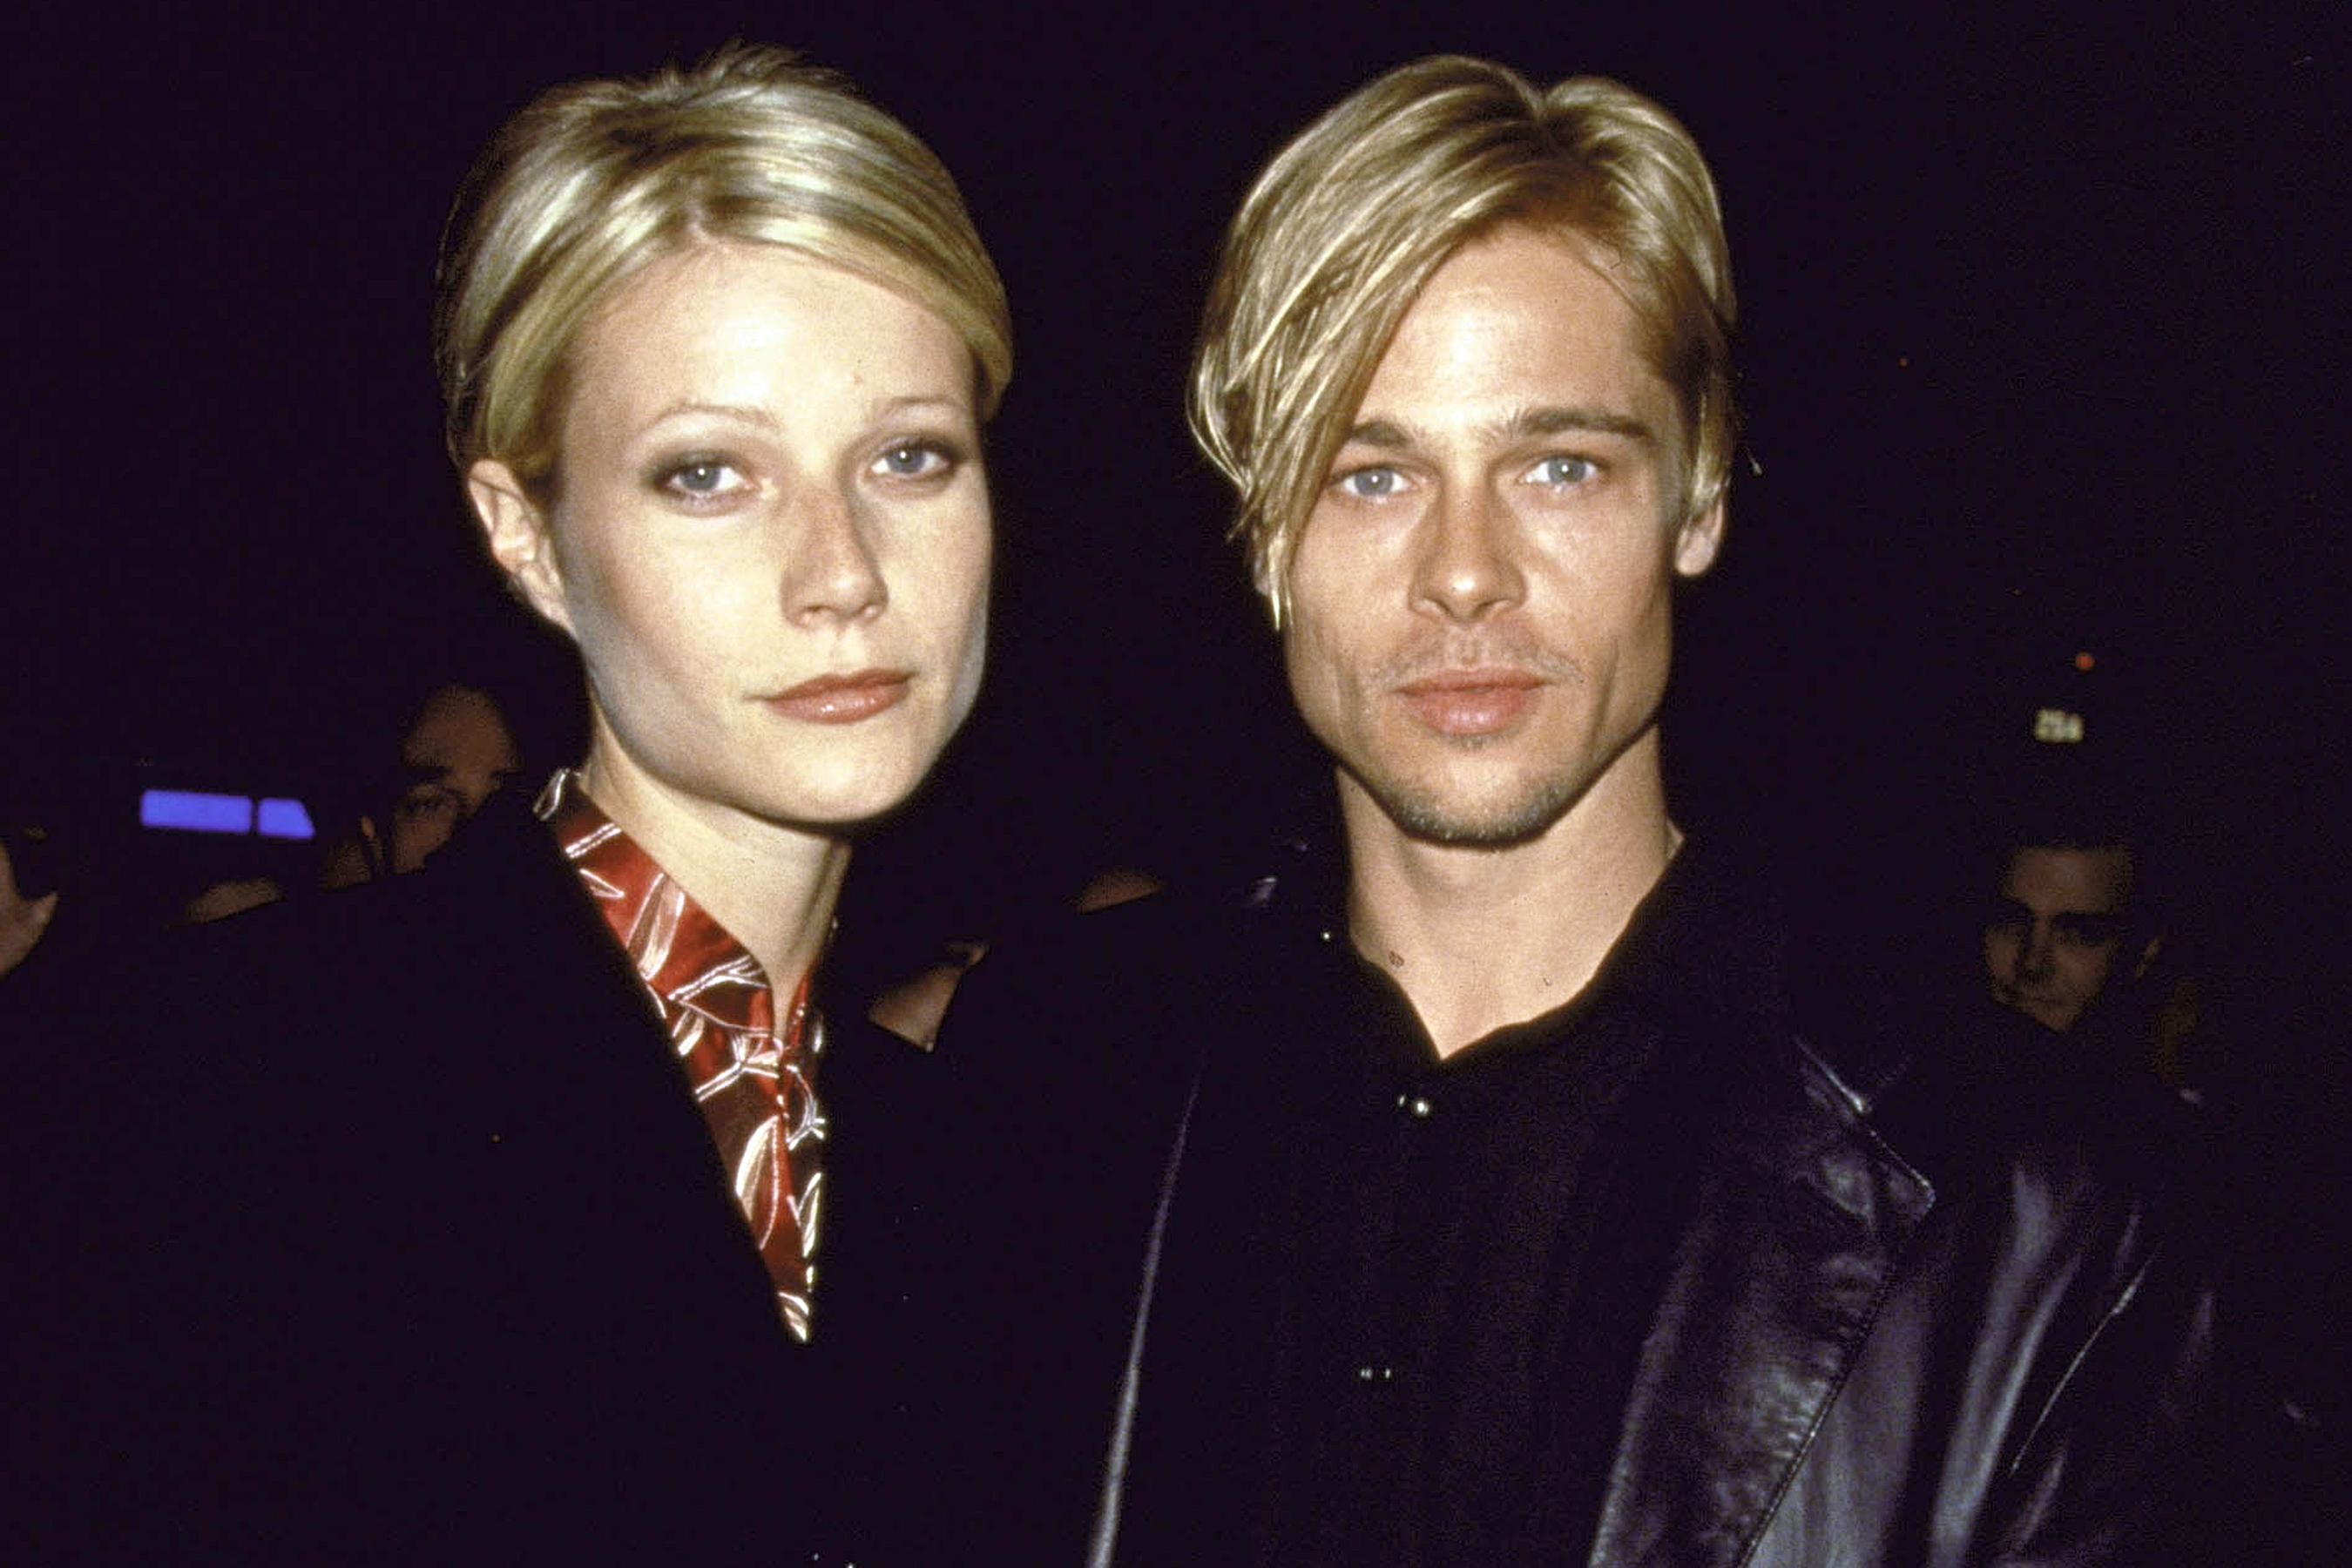 Gwyneth Paltrow és Brad Pitt